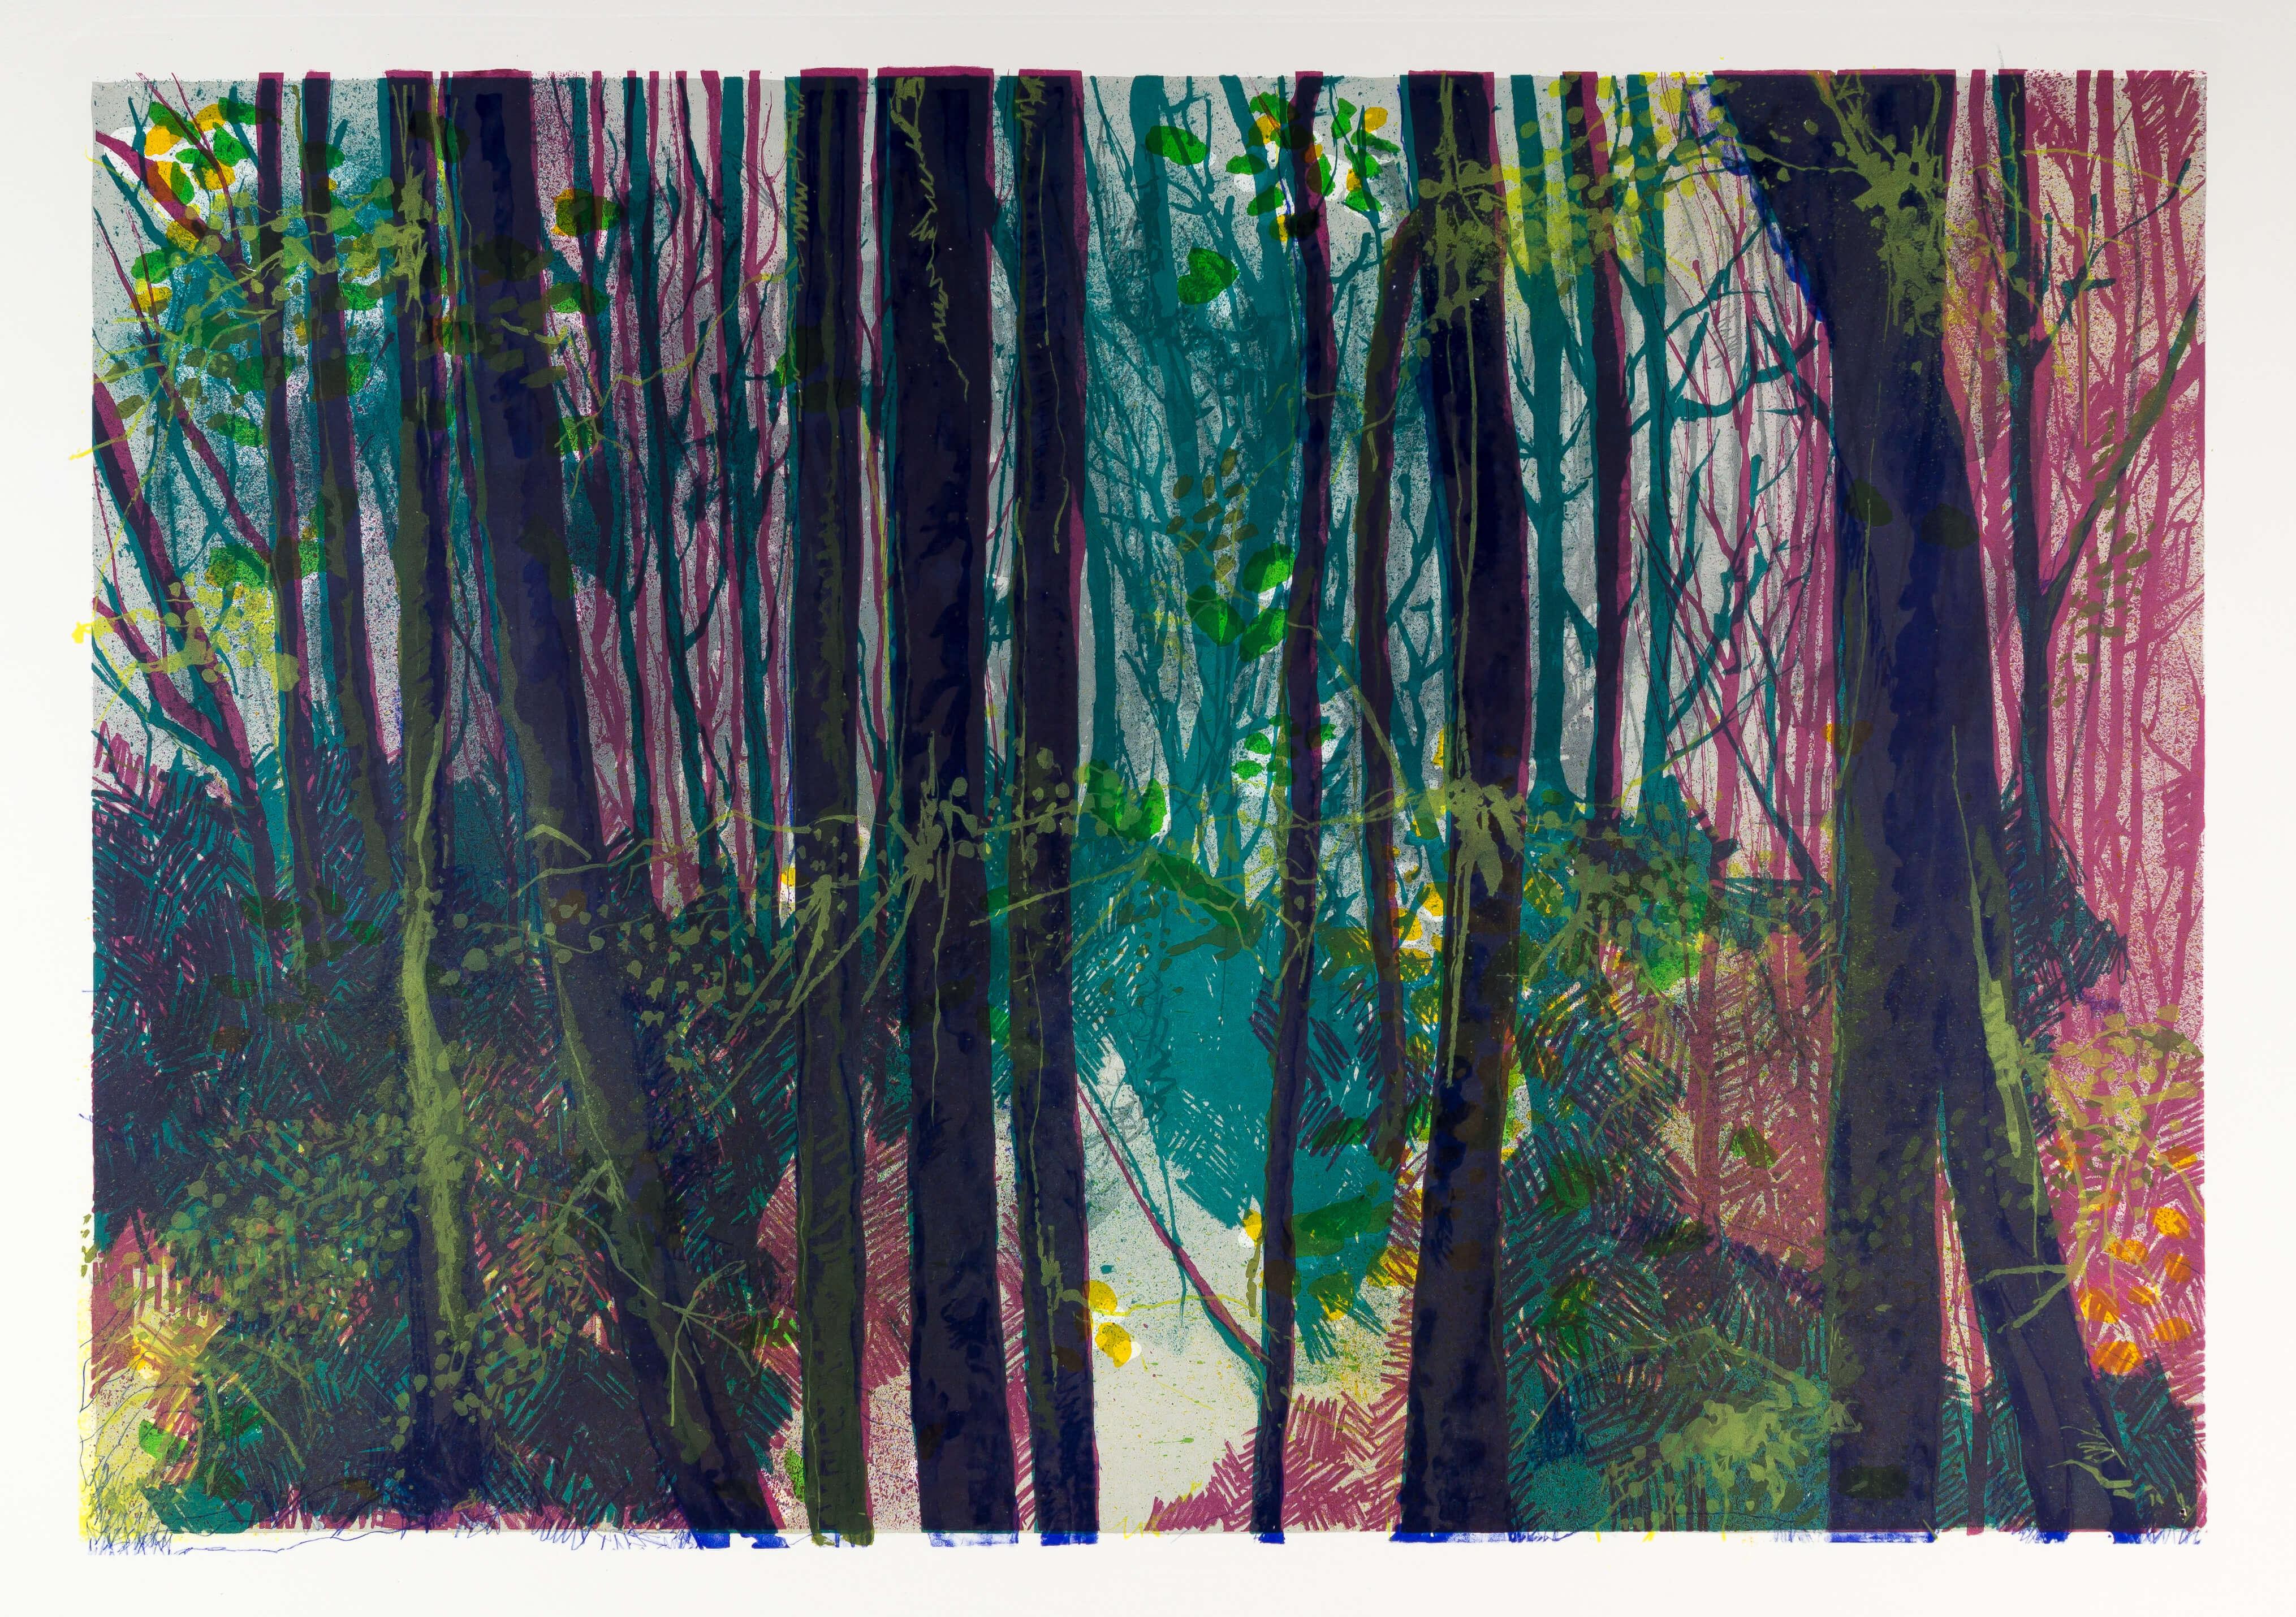 Katharina Albers, Wald XIV, 2014, Farblithographie, 3 Auflagen, 64×92 cm